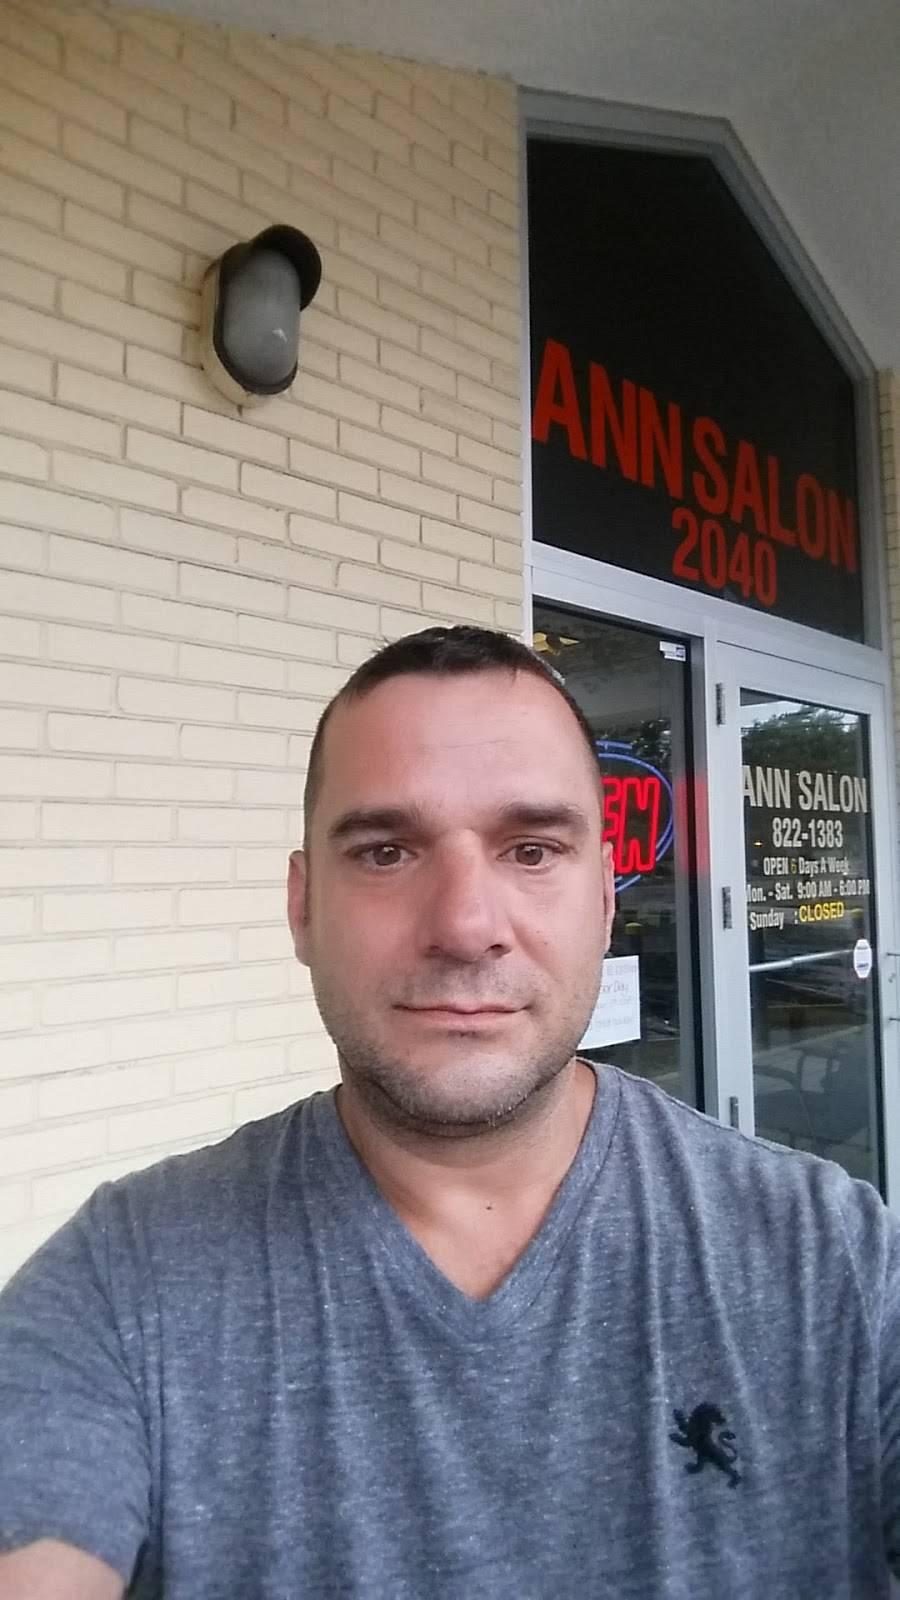 Anns Salon - hair care    Photo 6 of 7   Address: 2040 16th St N, St. Petersburg, FL 33704, USA   Phone: (727) 822-1383